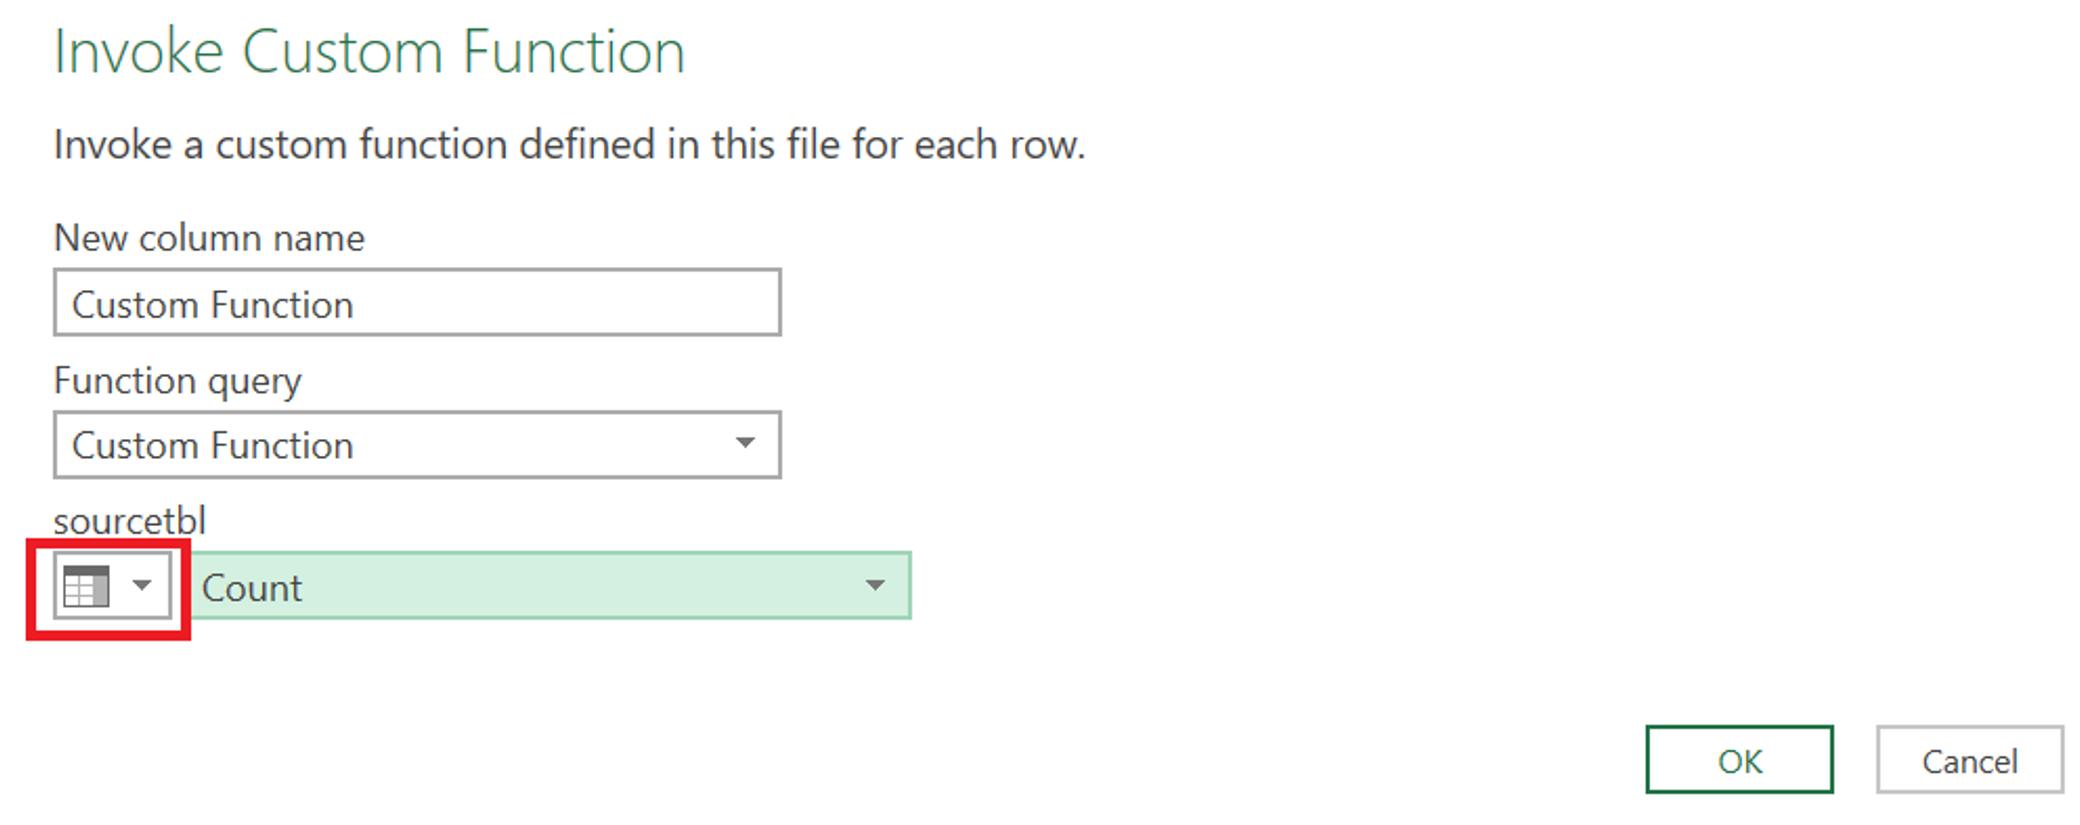 Invoke Custom Function Dialogue Box